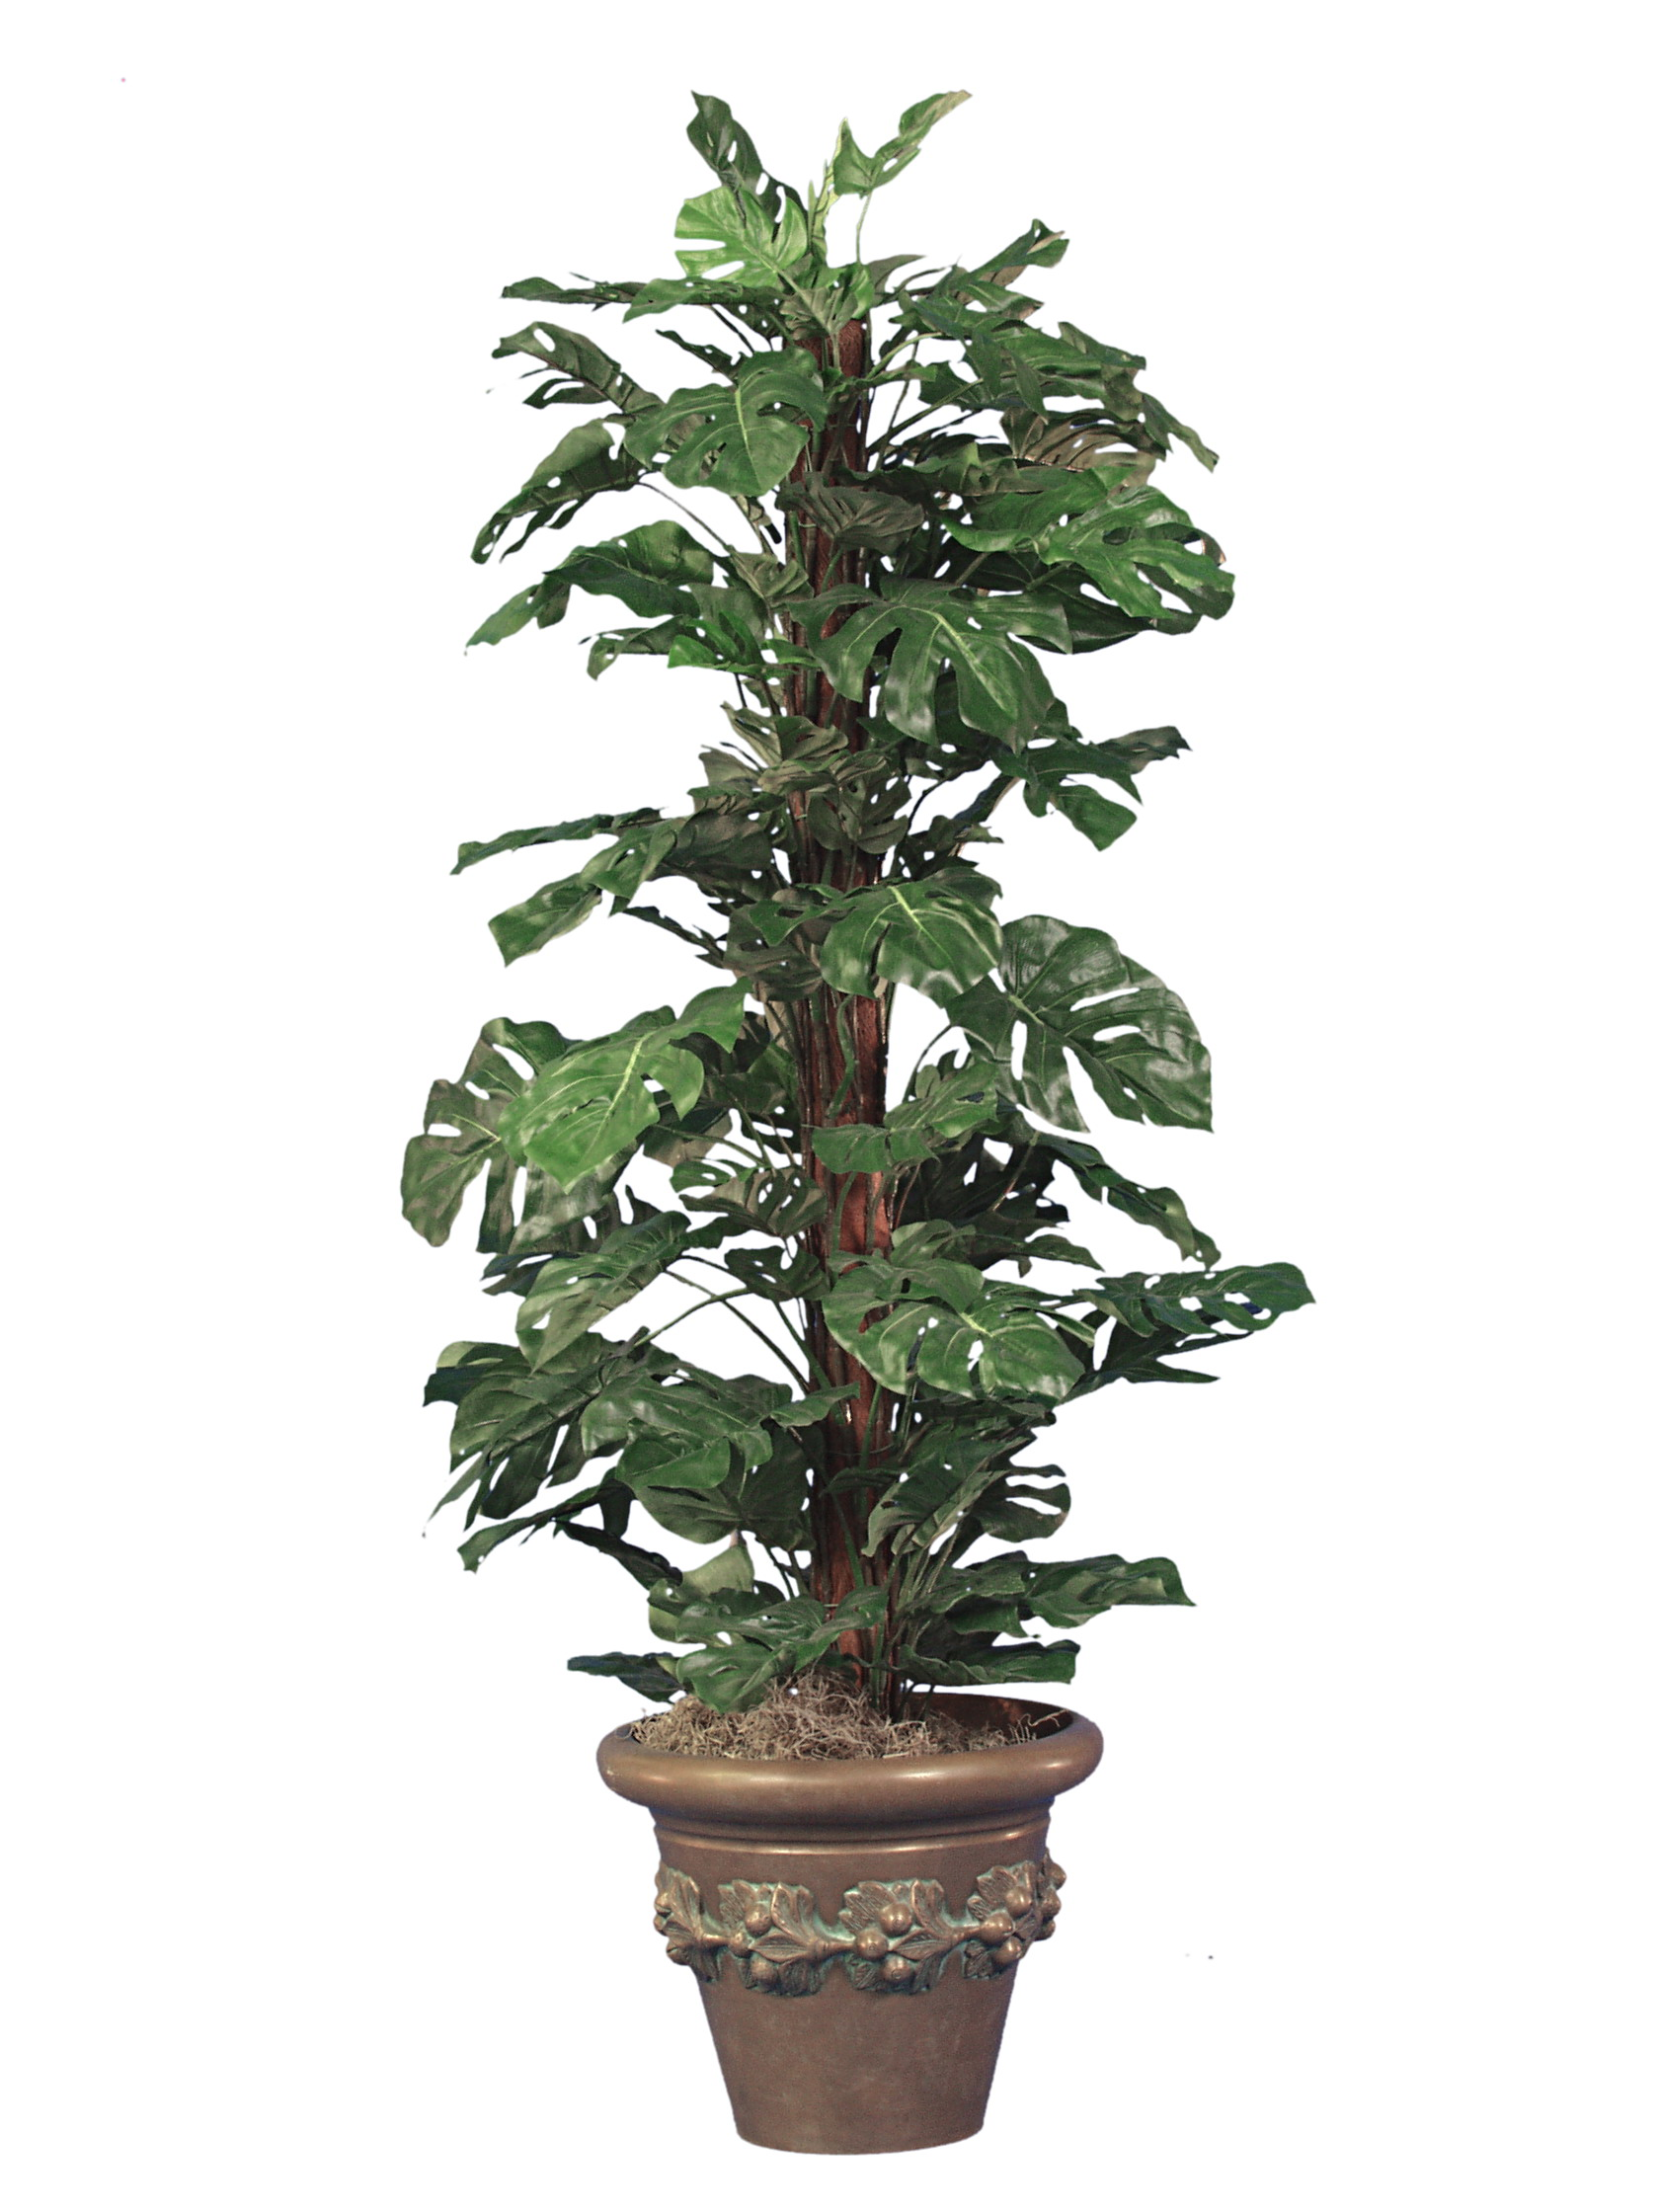 TSP 2200- Monstera plant